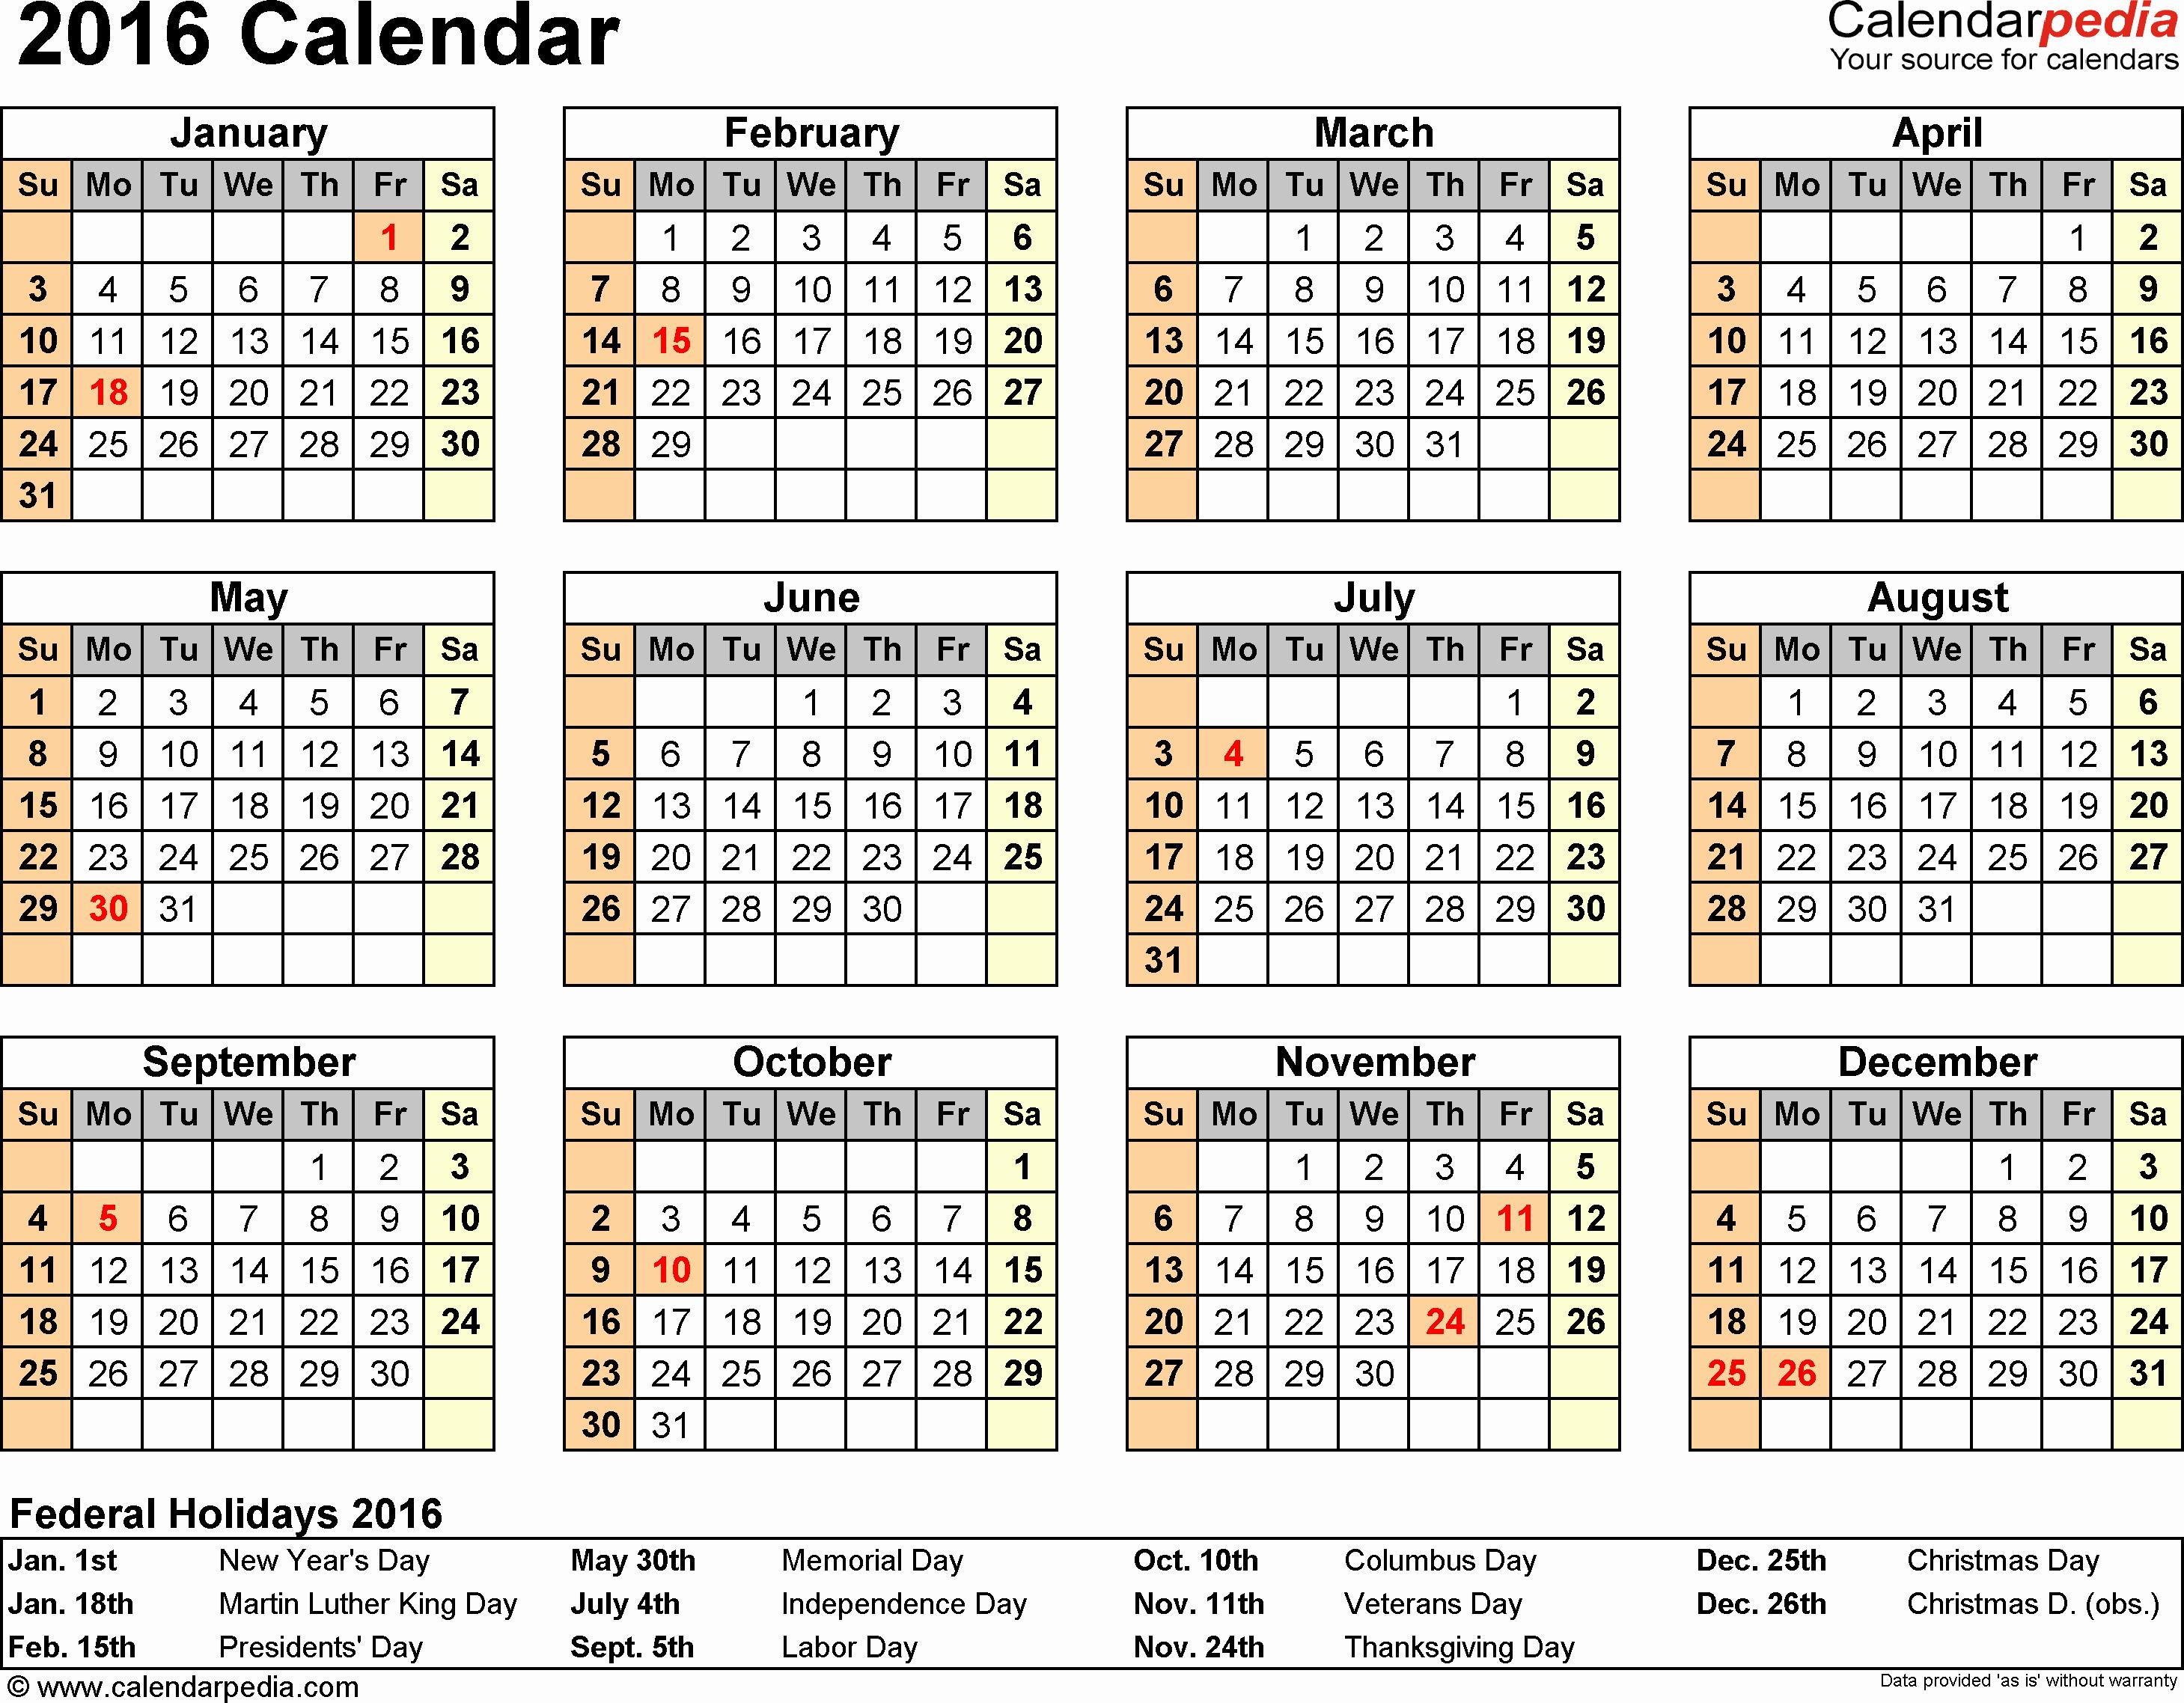 Free Printable Calendars 2016 Templates Lovely 2016 Calendar 16 Free Printable Word Calendar Templates